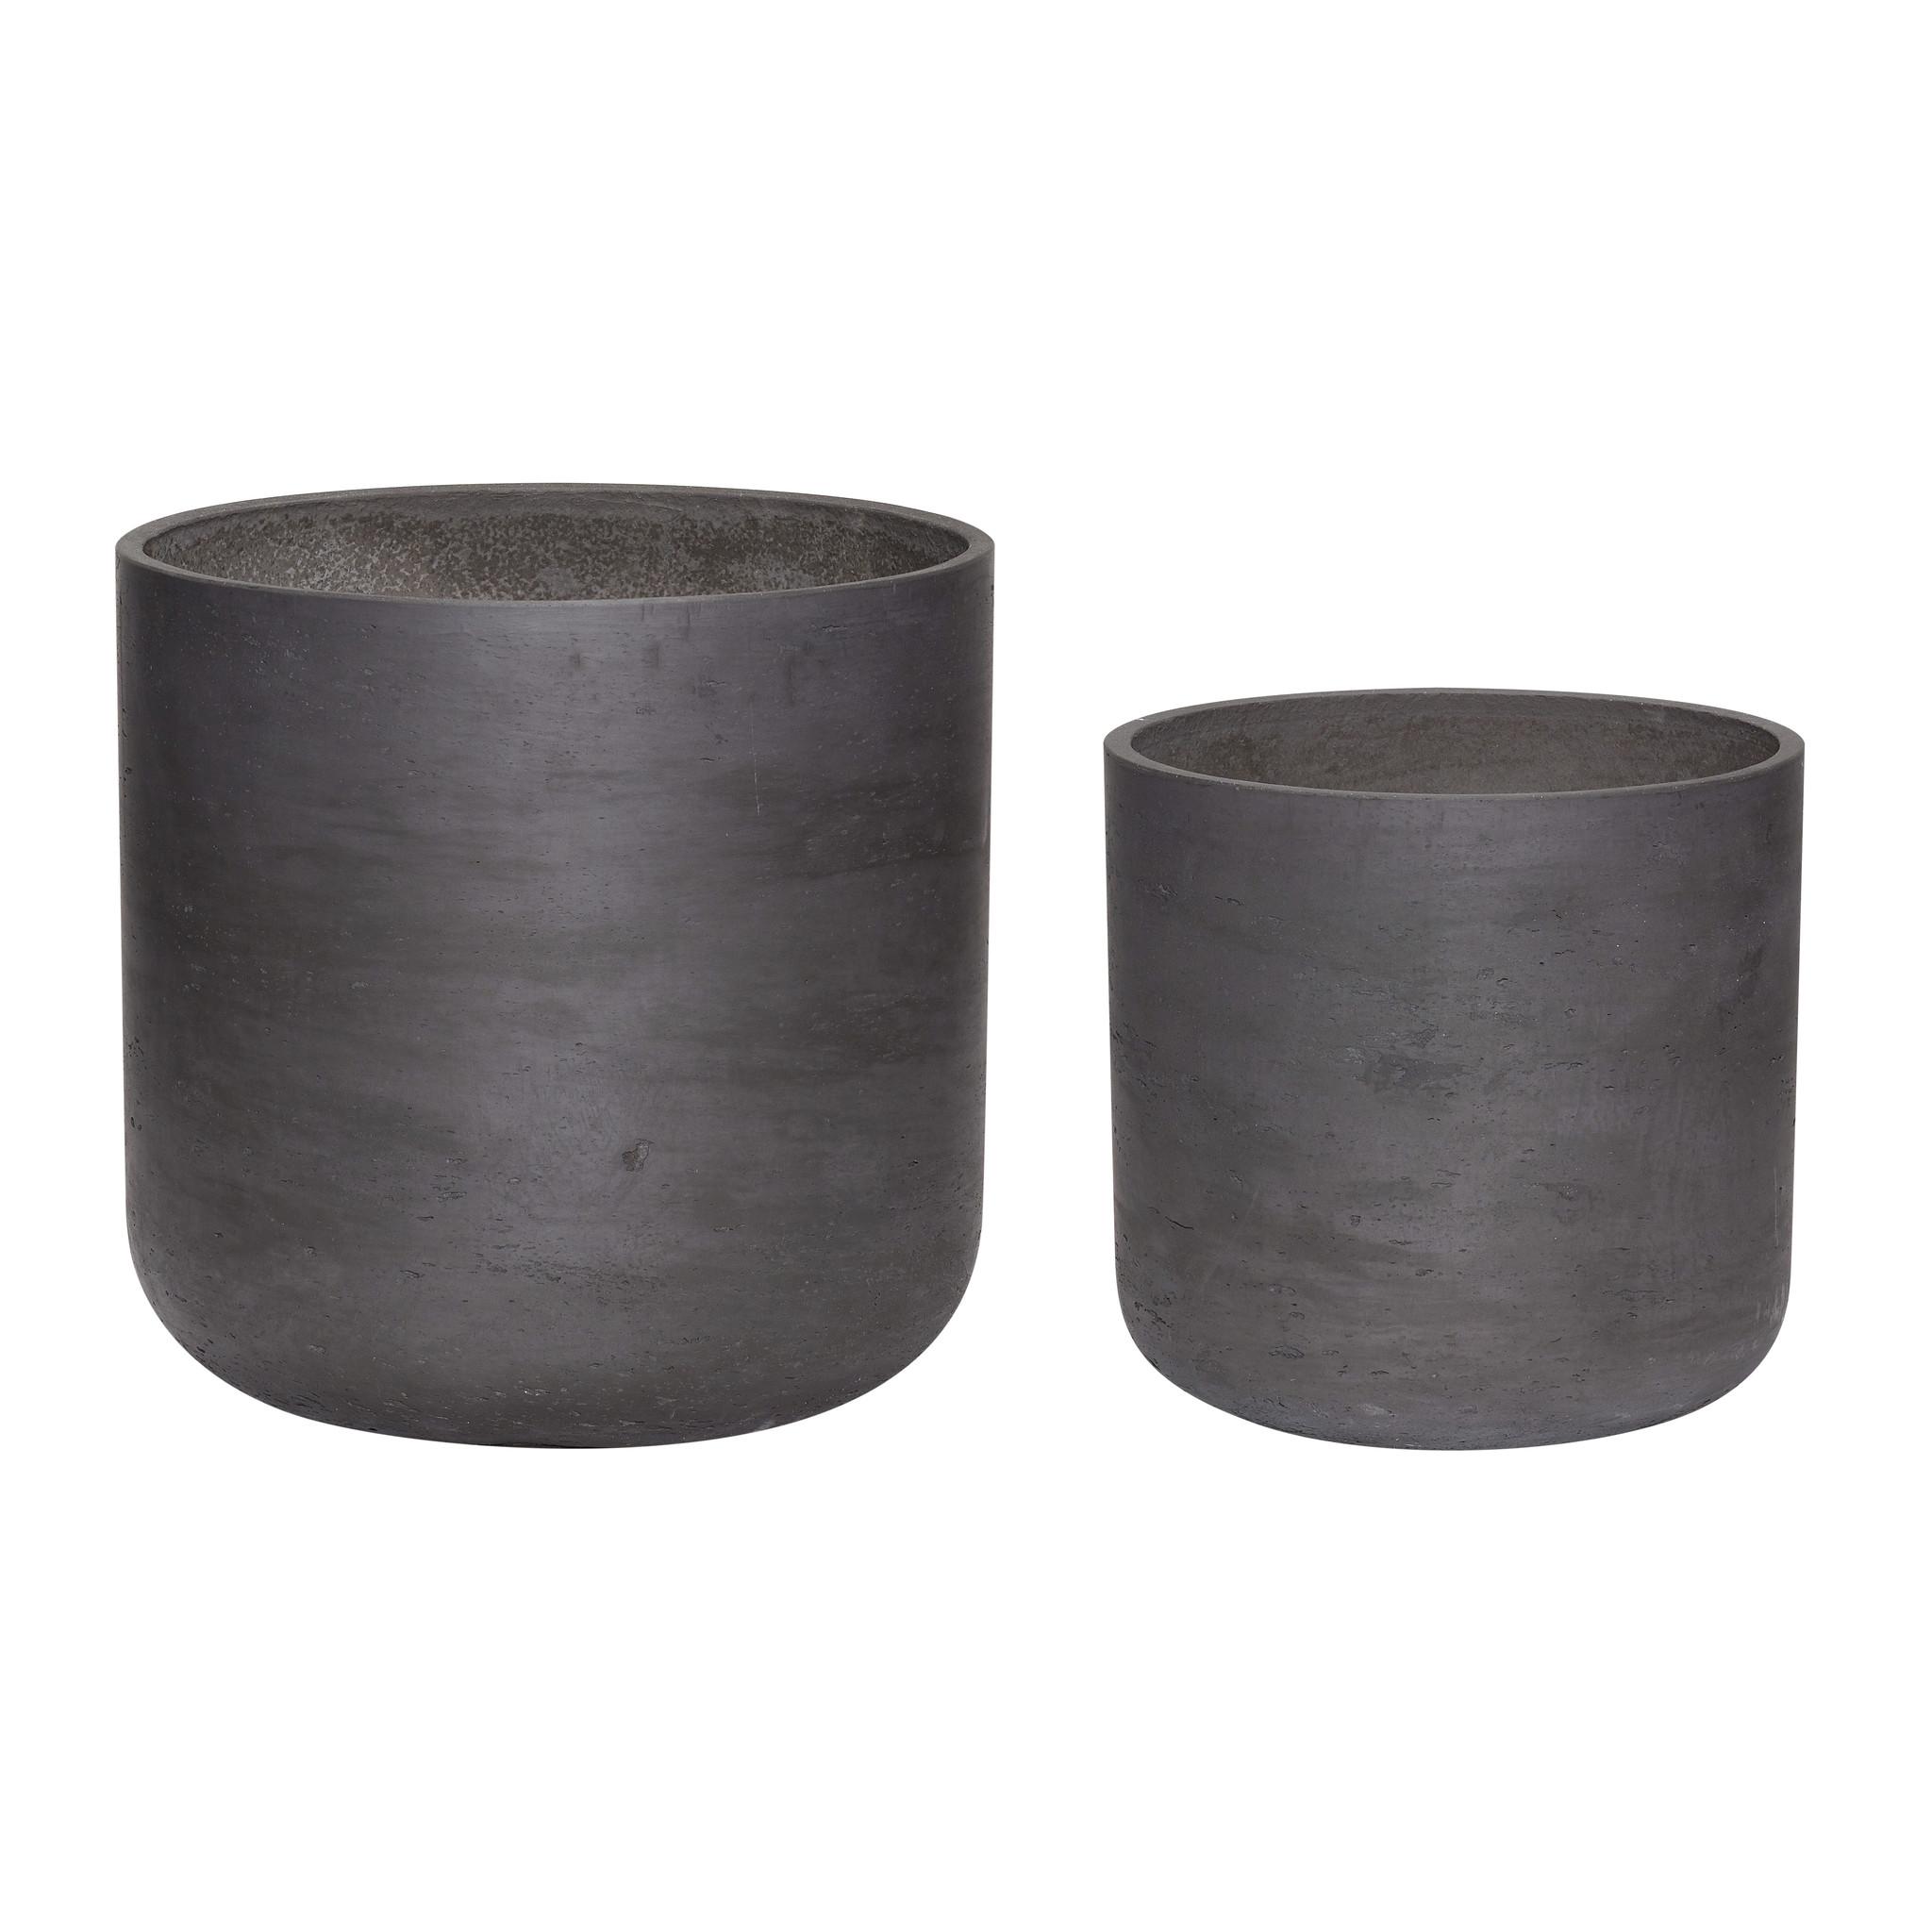 Hubsch Pot met gat, cement, zwart, set van 2